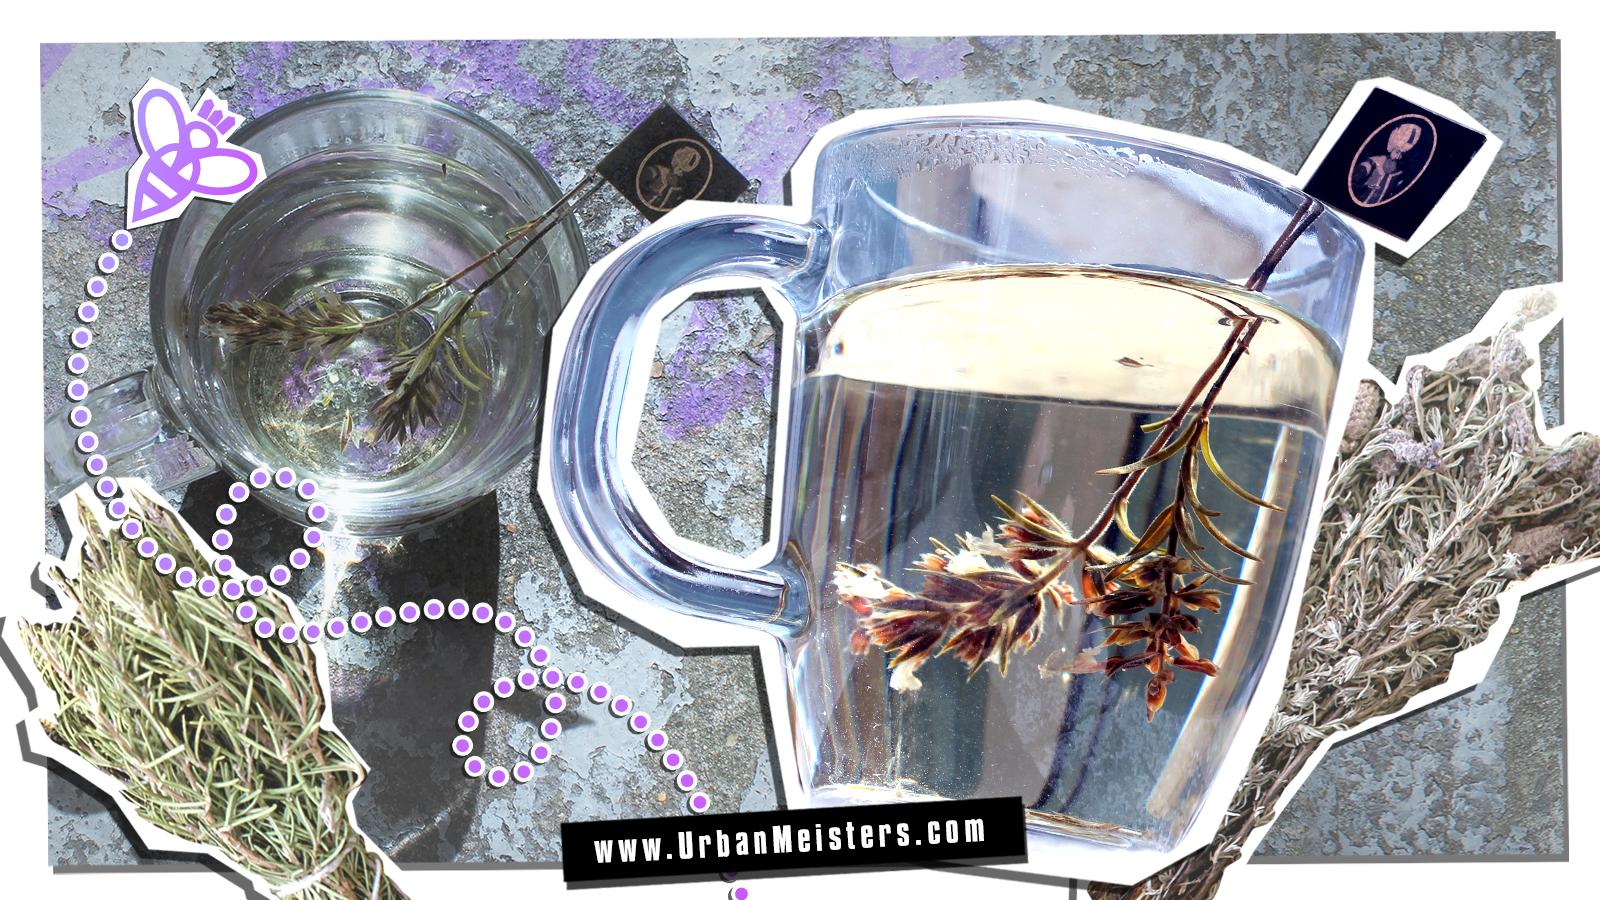 [SUPERFOODS] Herbal Tea Guide for Urbans by LE BÉNÉFIQUE